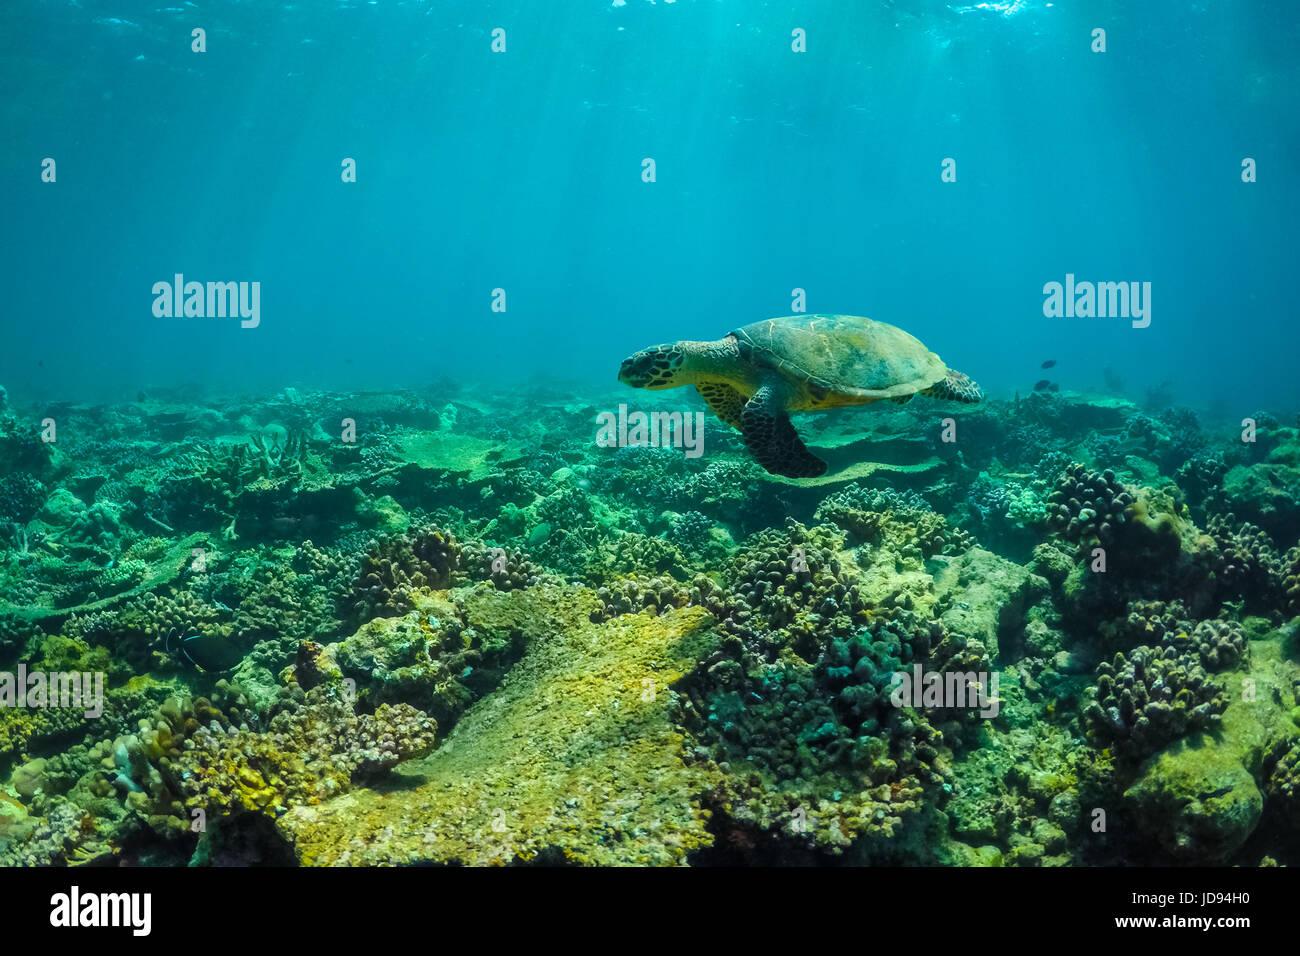 underwater sealife underwater animals sea turtle close up over